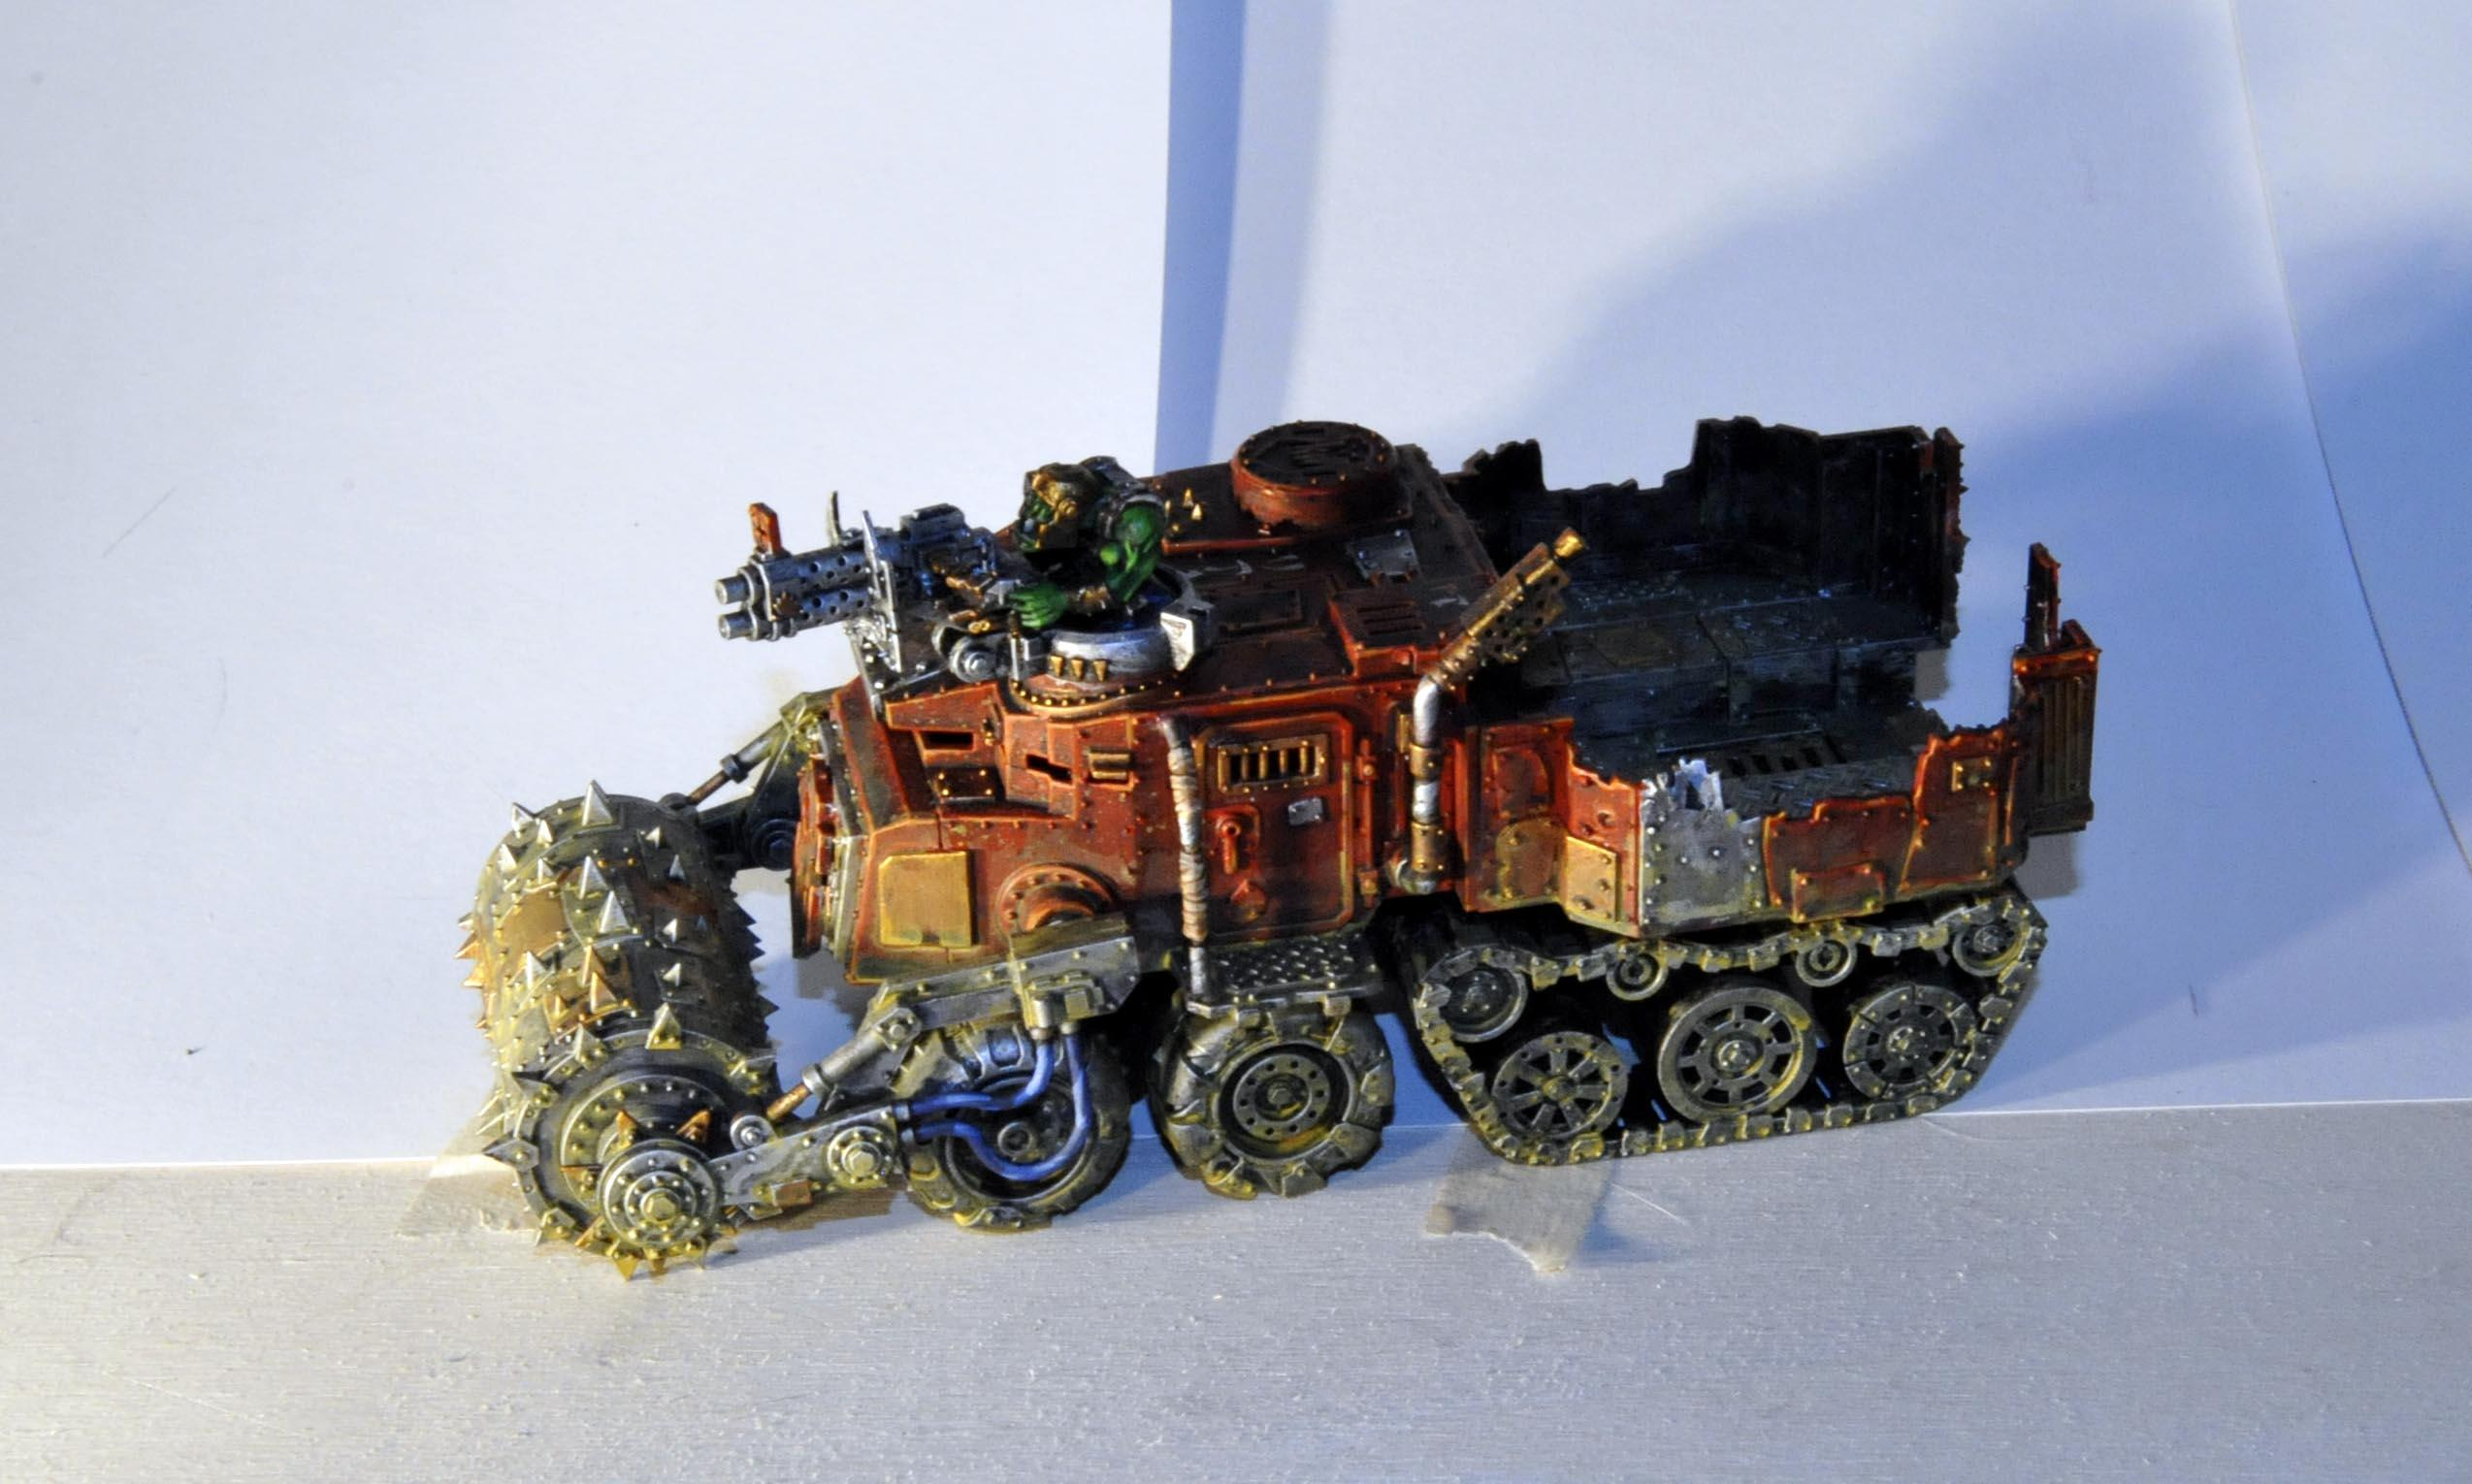 Battlewagon, Deff Rolla, Orks, Red, Seed Freaks